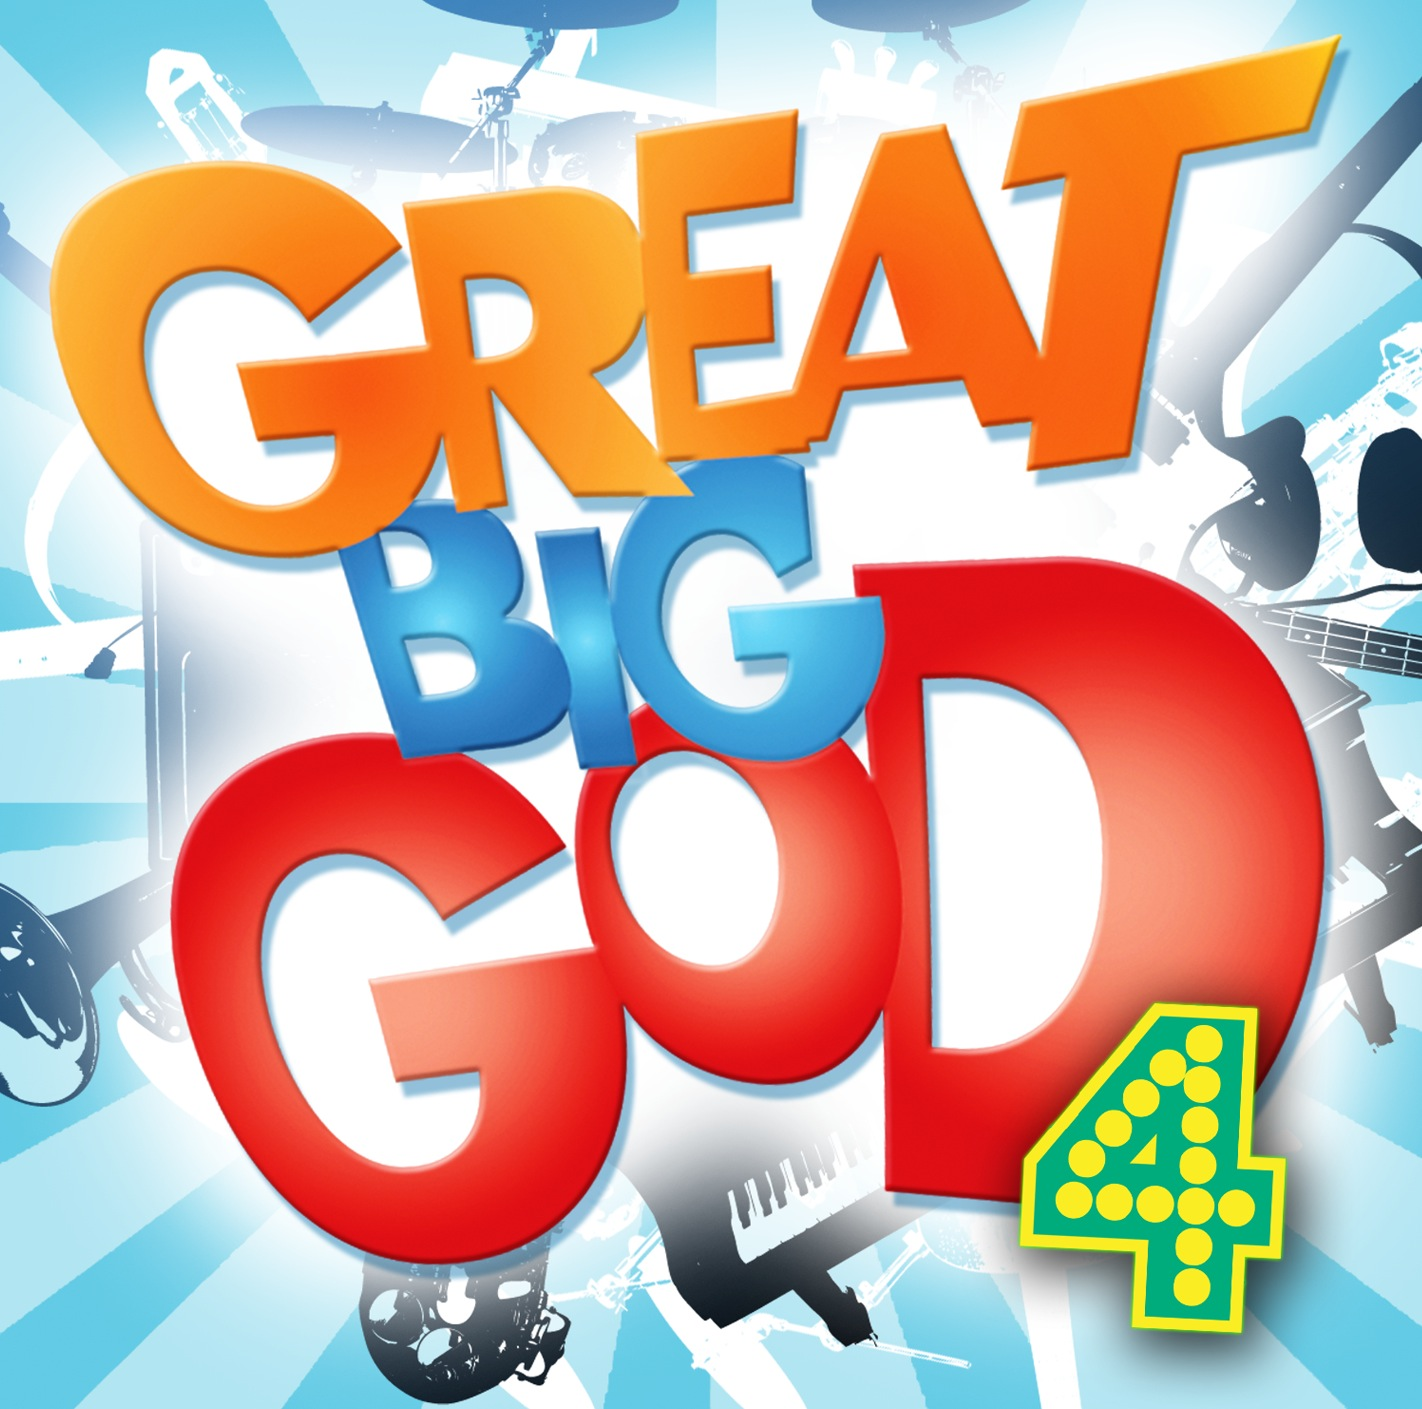 our god is a great big god pdf